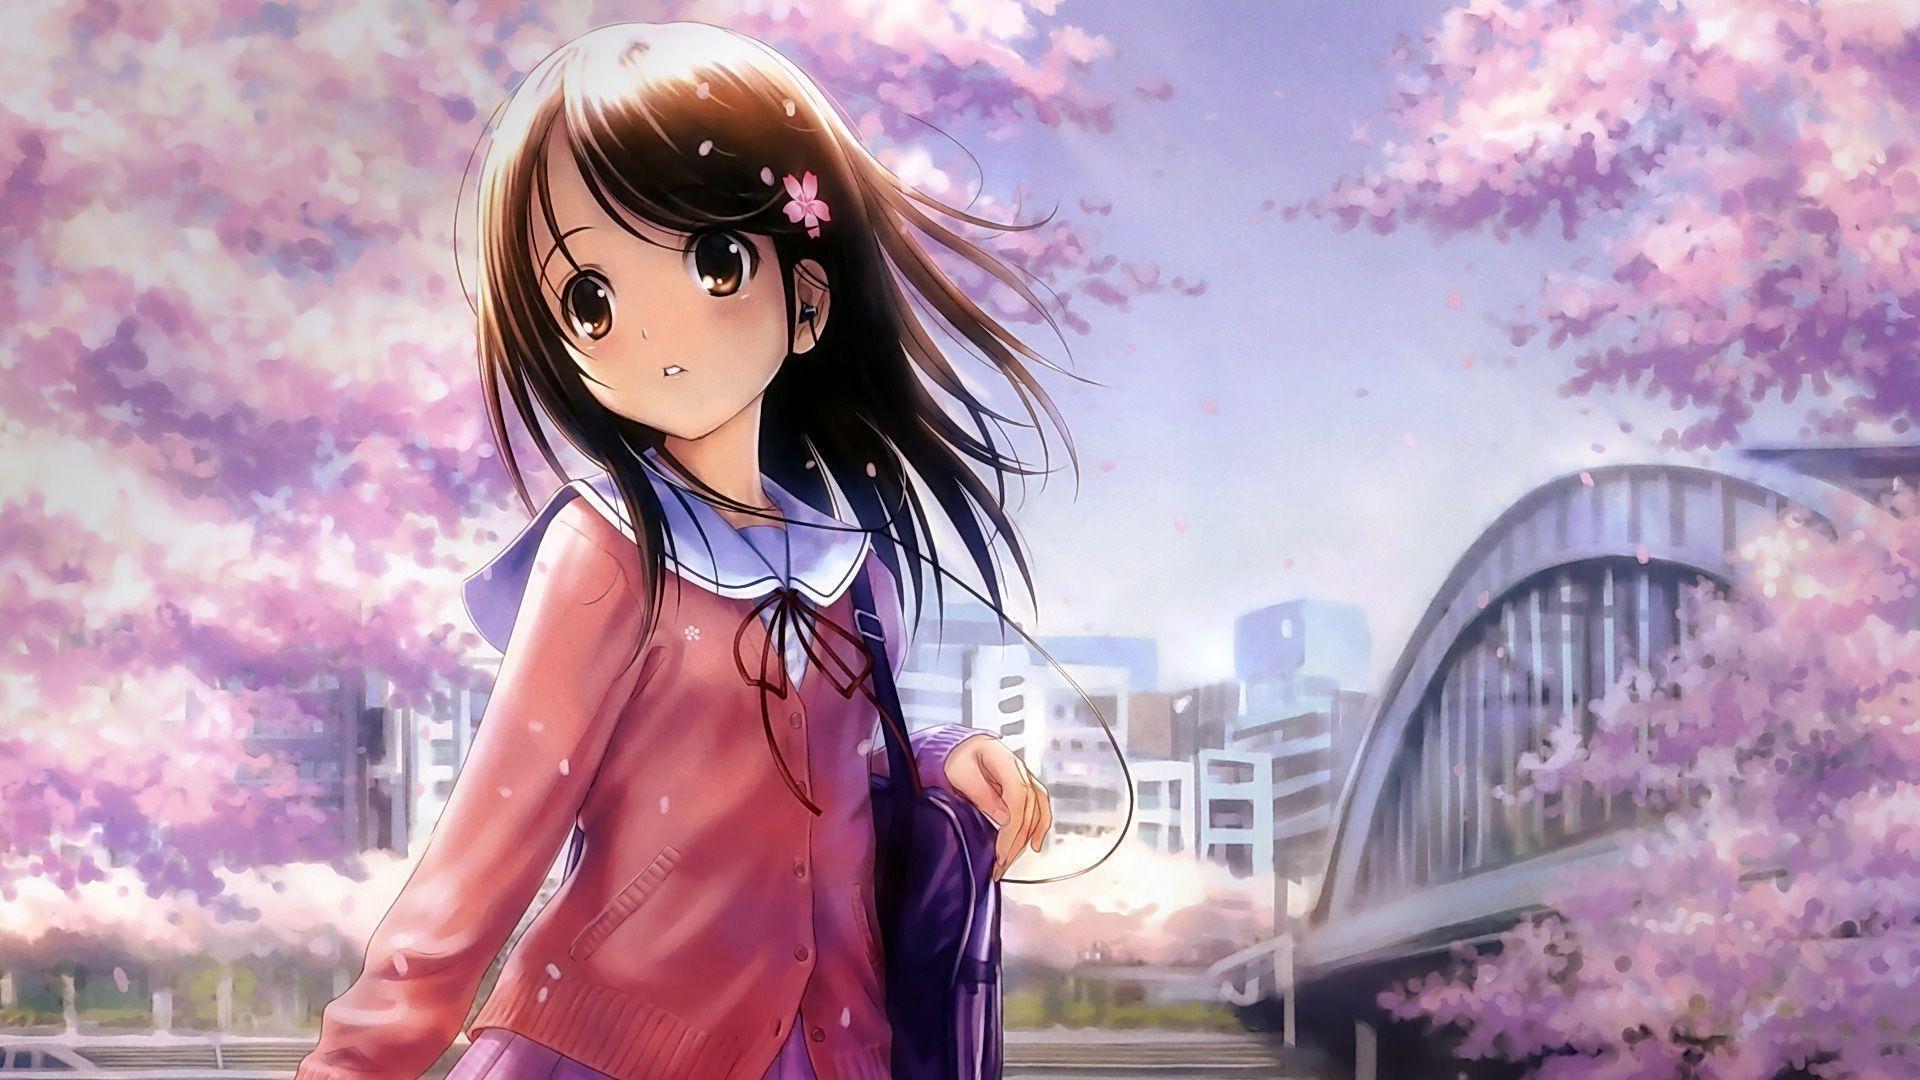 51 best free kawaii cute girly wallpapers - wallpaperaccess